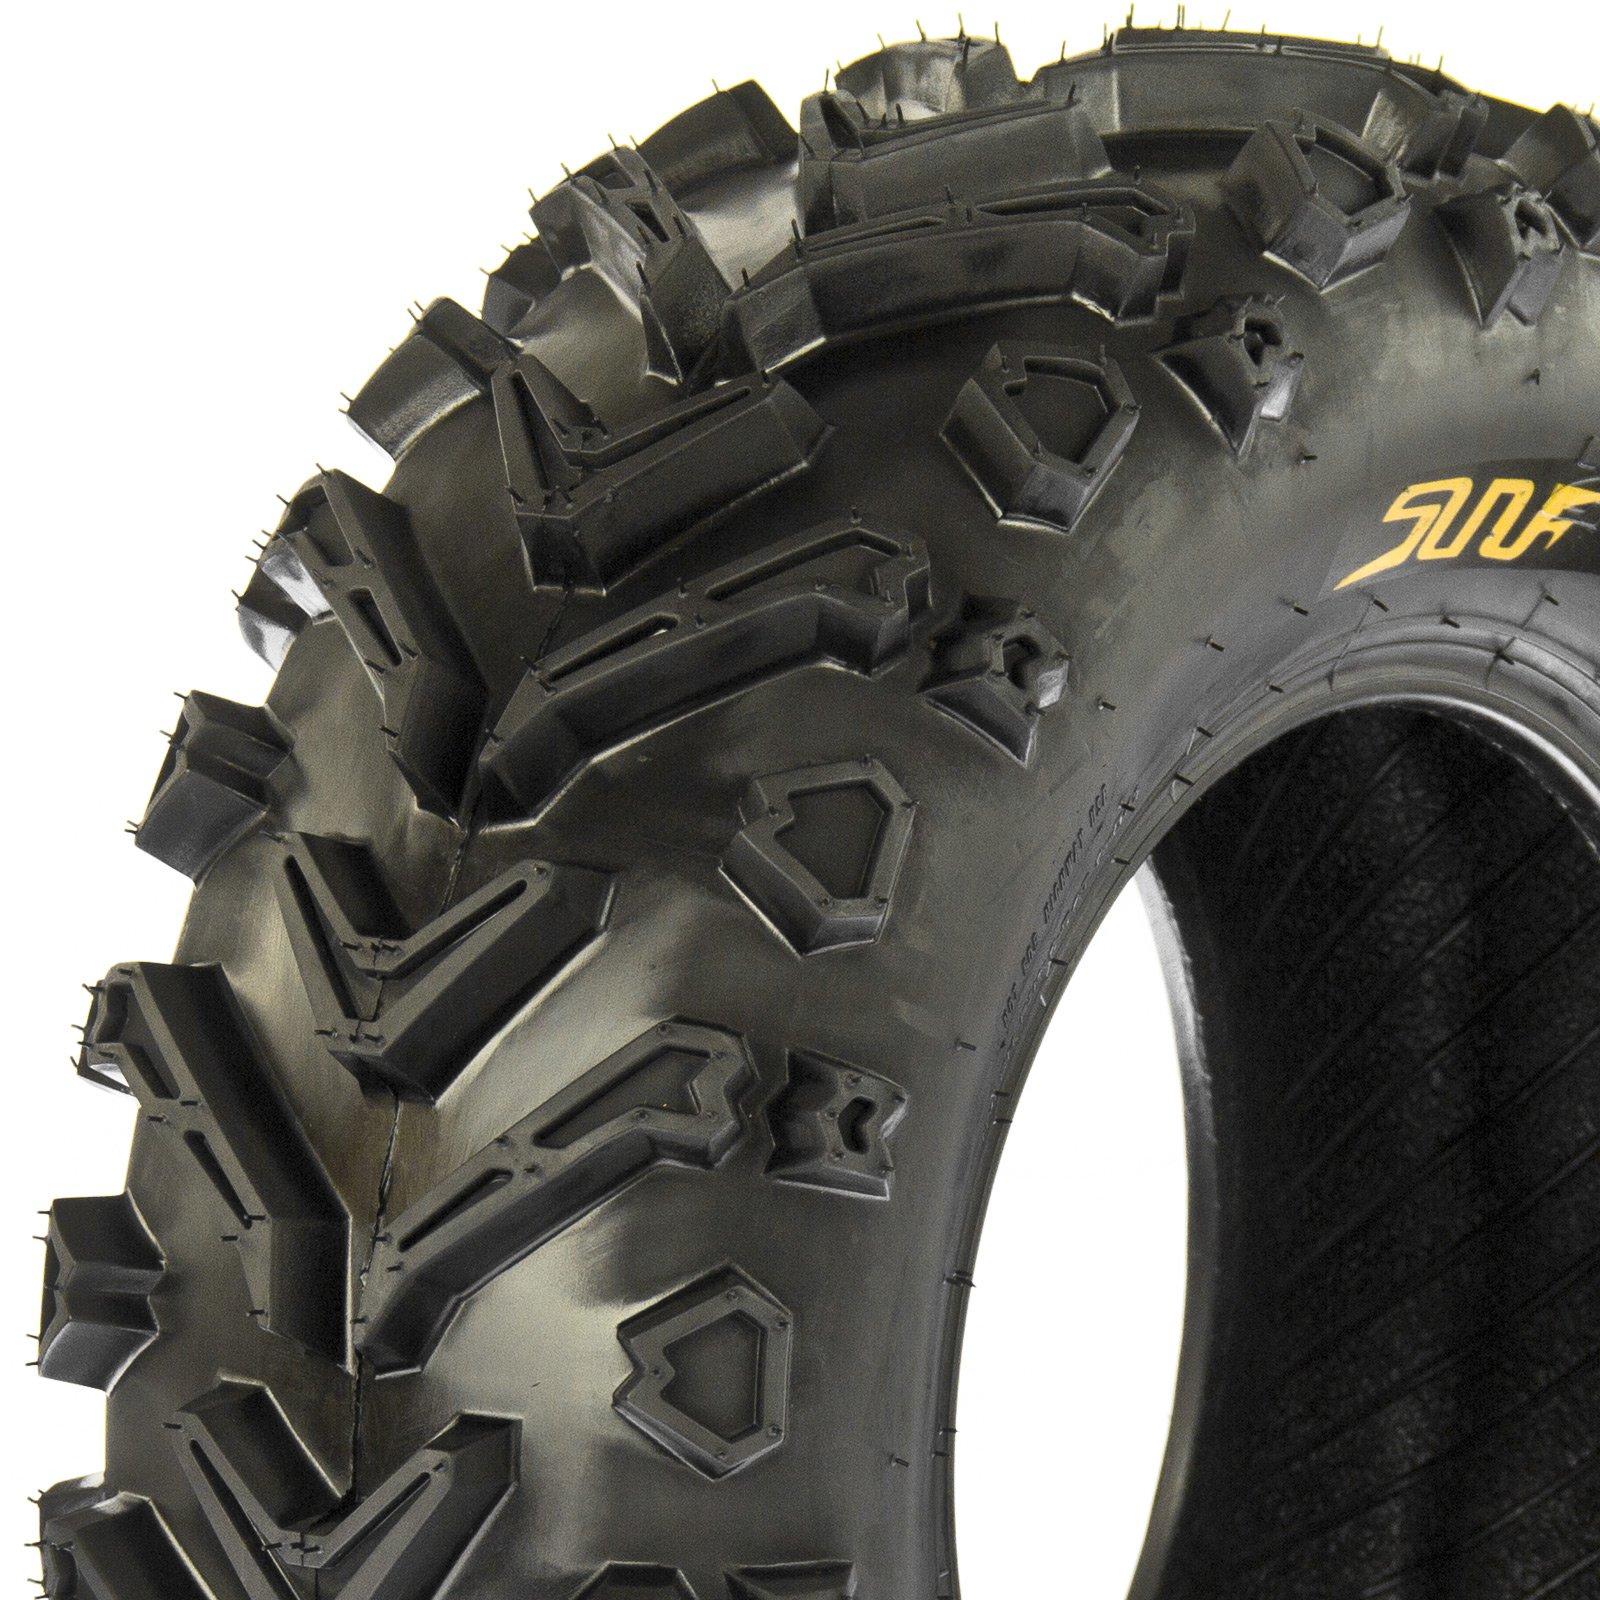 SunF All Trail & Mud ATV UTV Tires 24x8-12 24x10-11 6 PR A041 (Complete Full Set of 4) by SunF (Image #6)